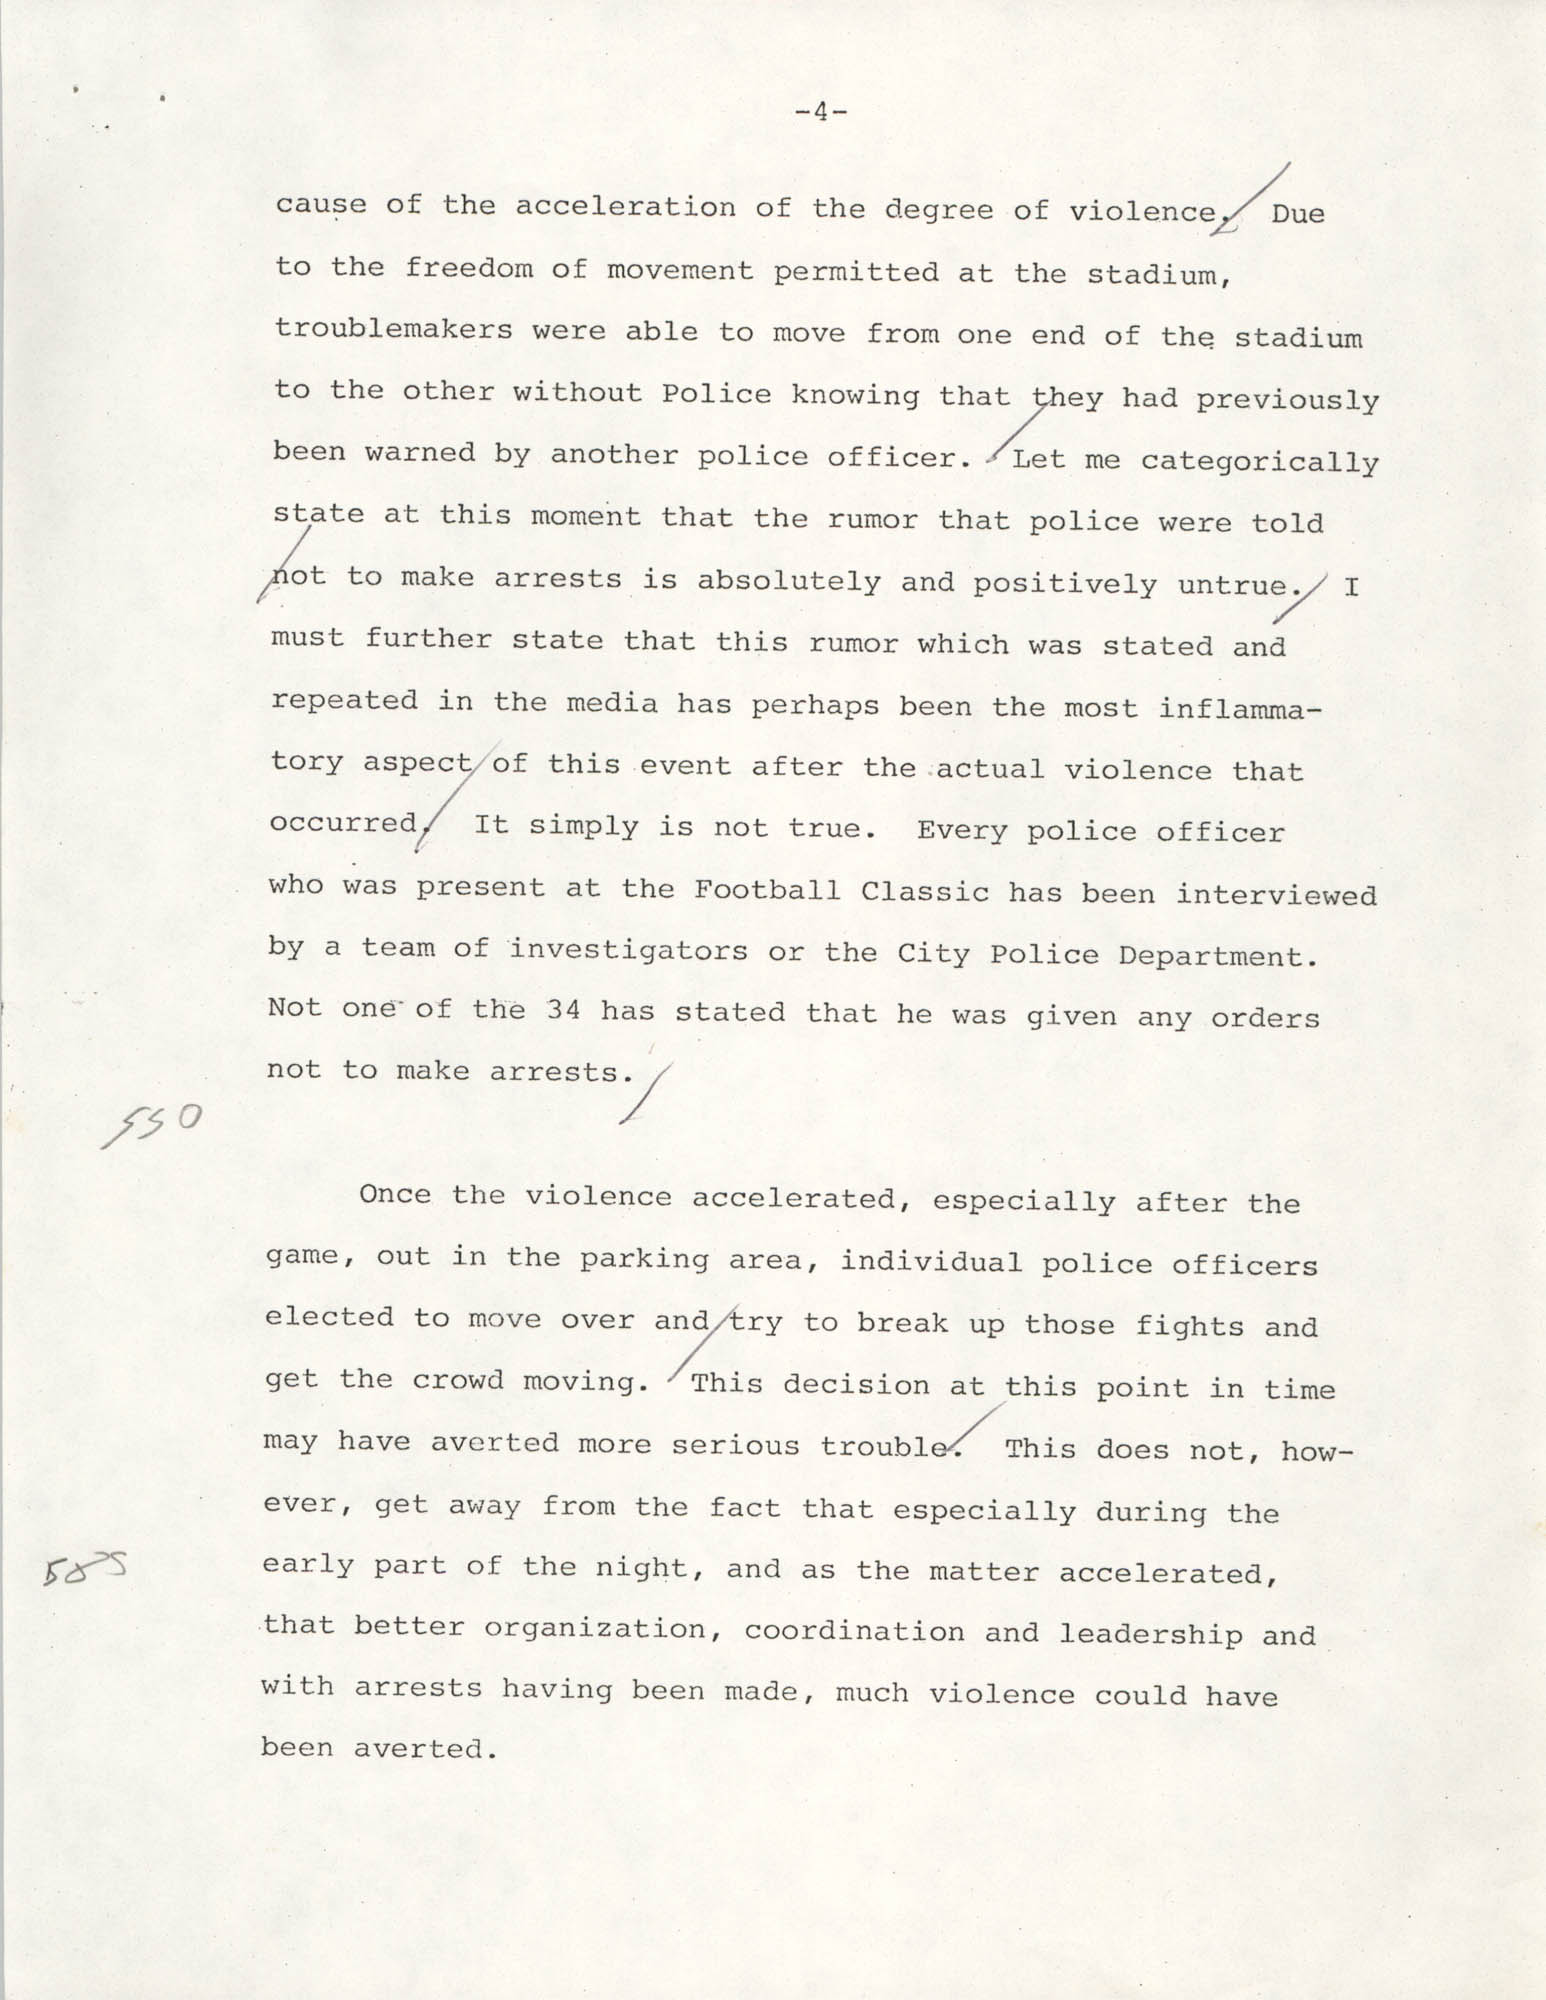 Typescript Speech on the Sertoma Football Classic, Page 4